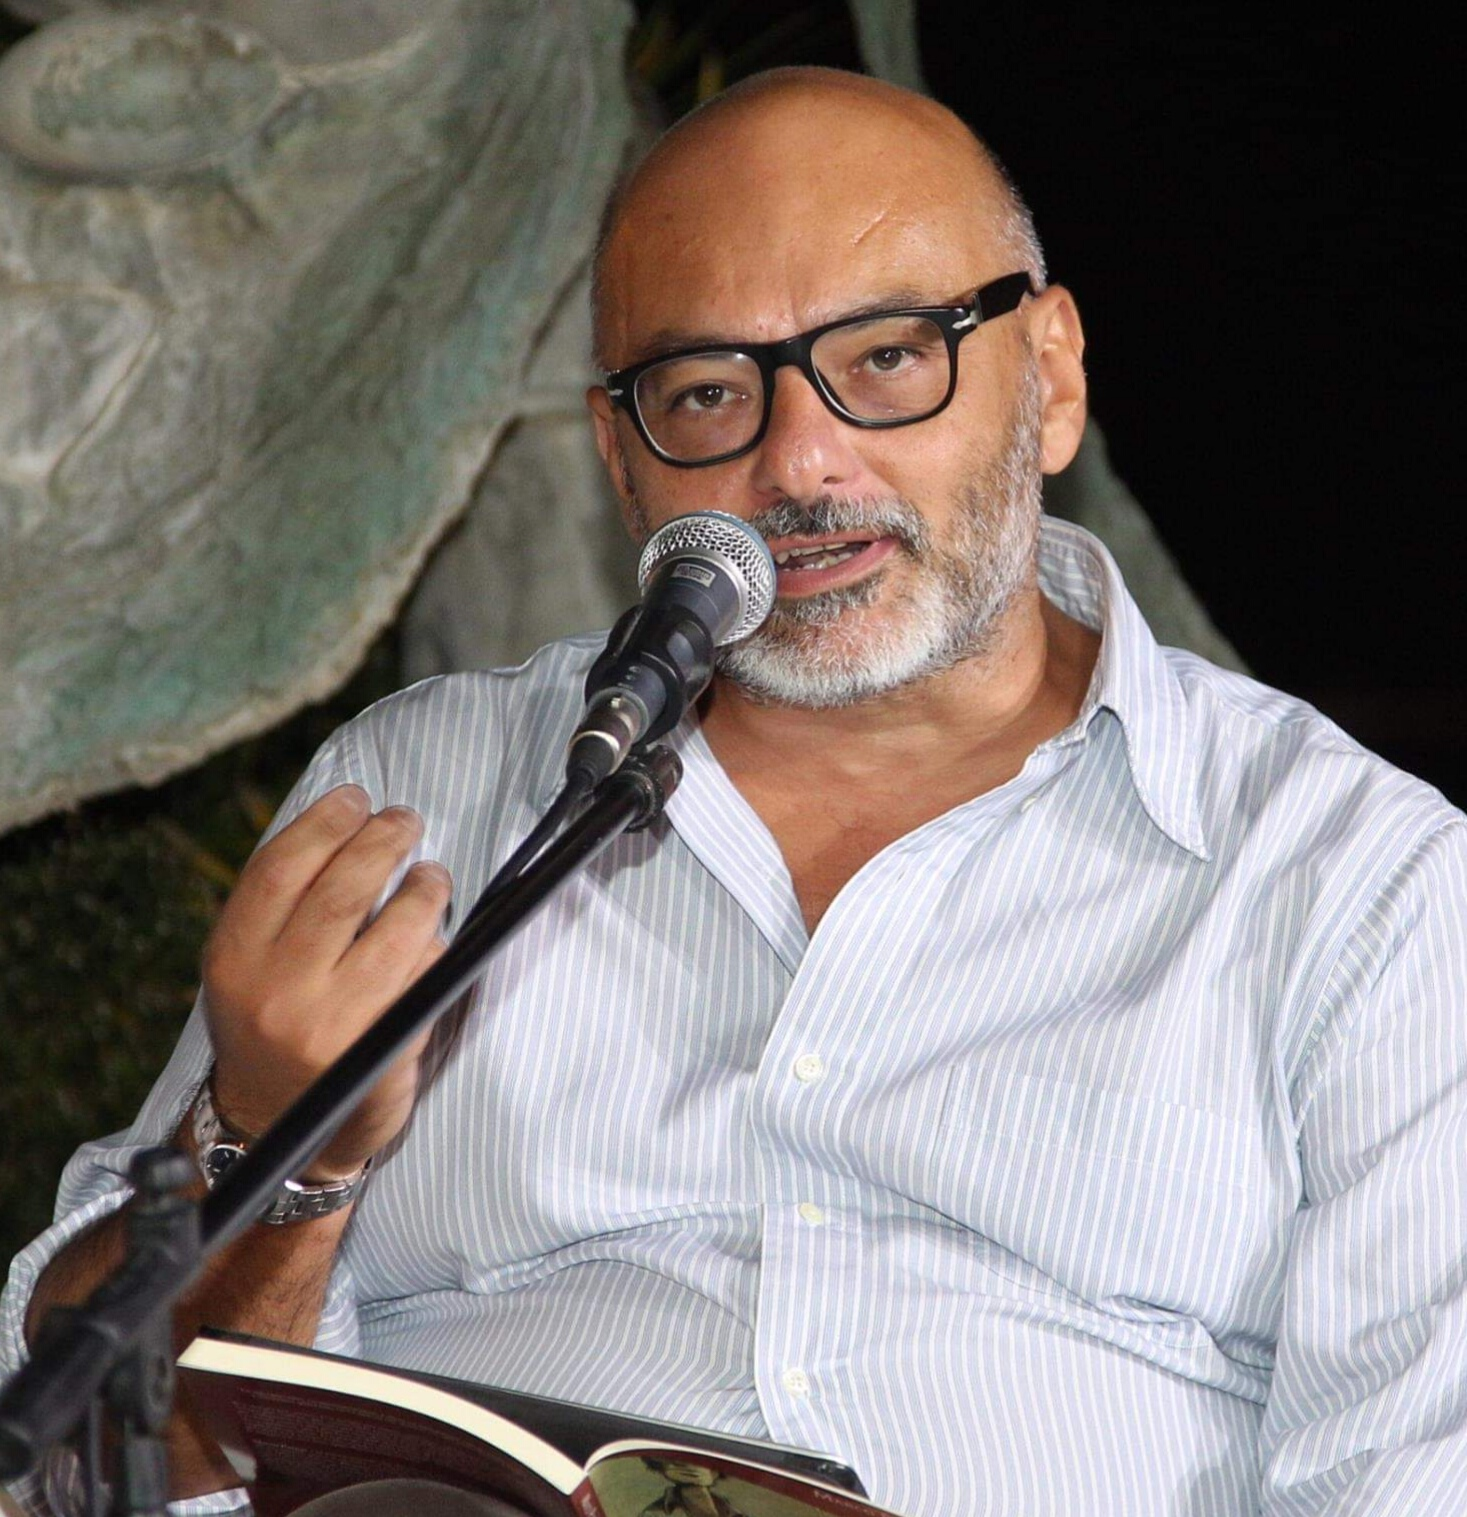 Francesco Massaro